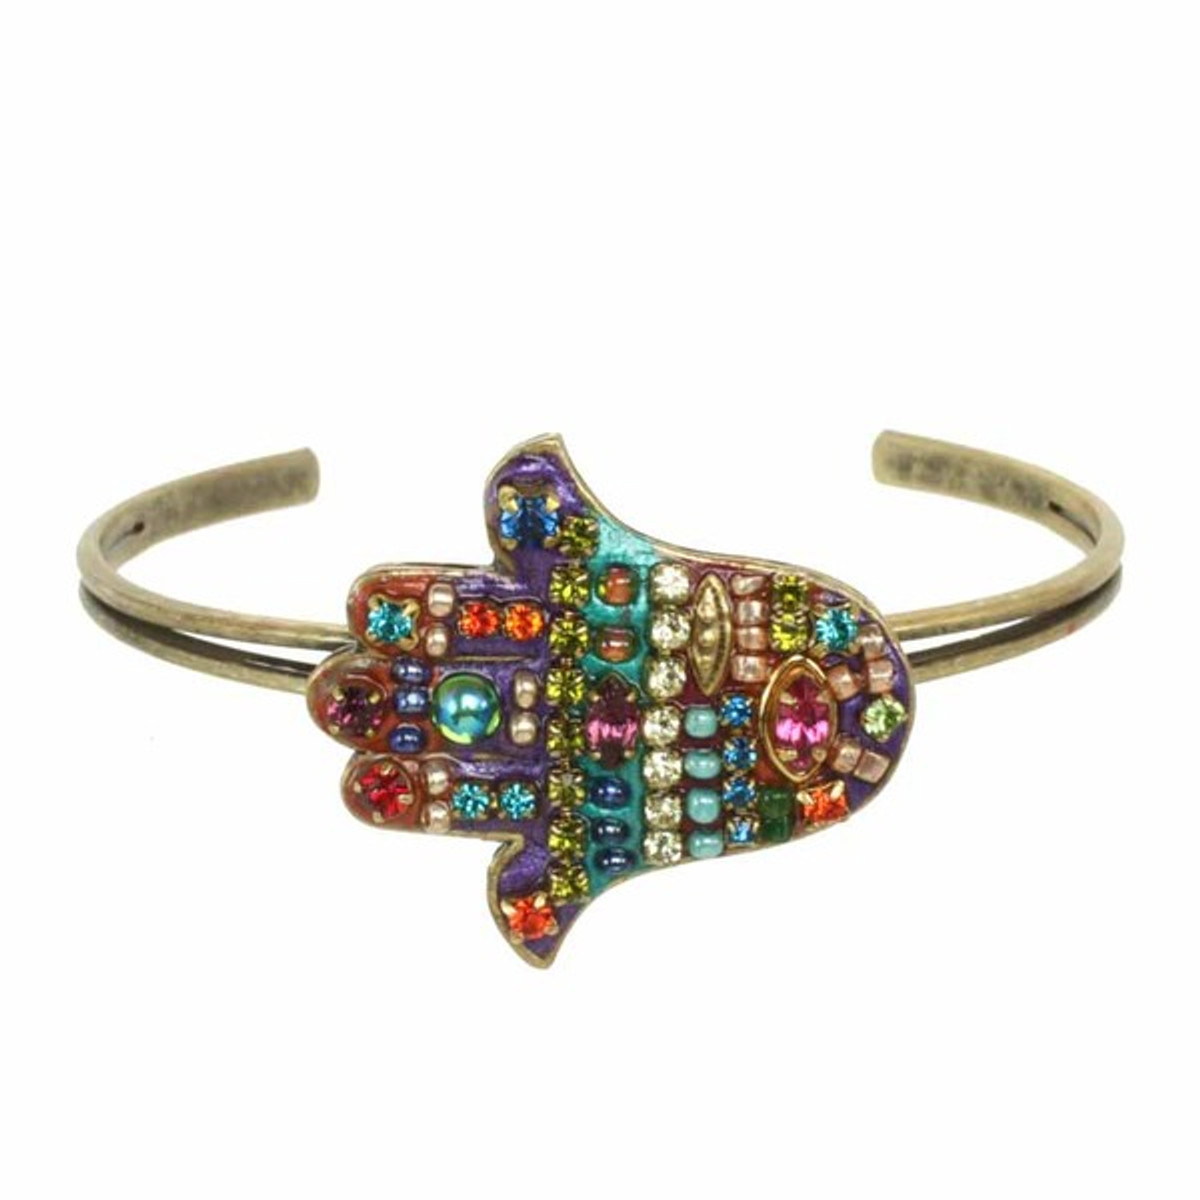 Adjustable Hamsa Cuff Bracelet by Michal Golan